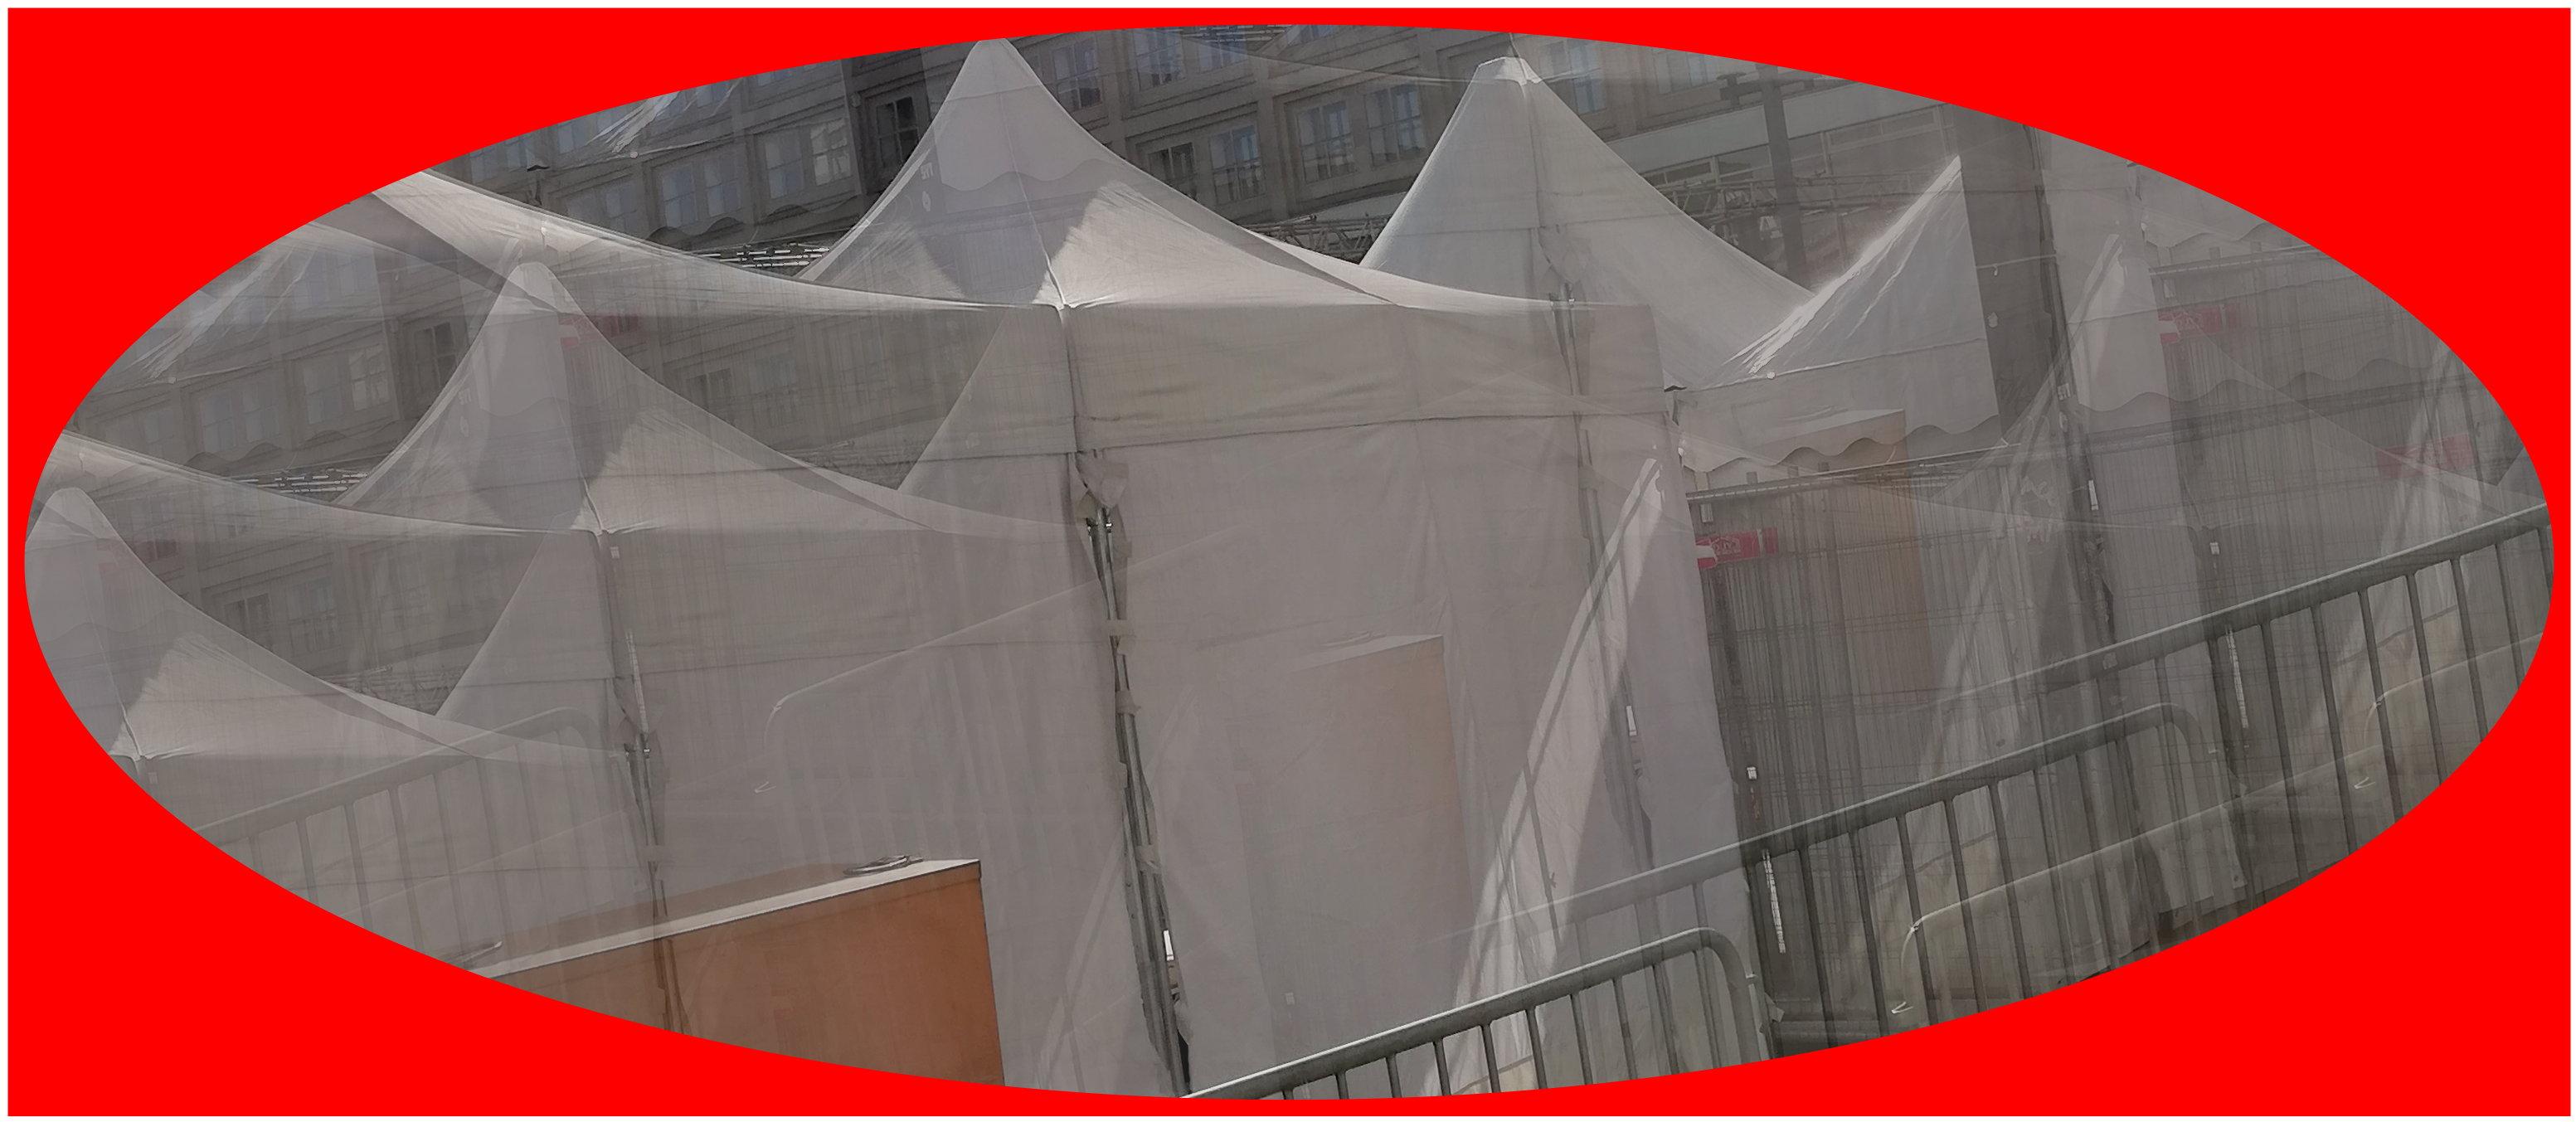 Notfall-zelte-Koordinations-planungs-System endstation-obdachlos.de